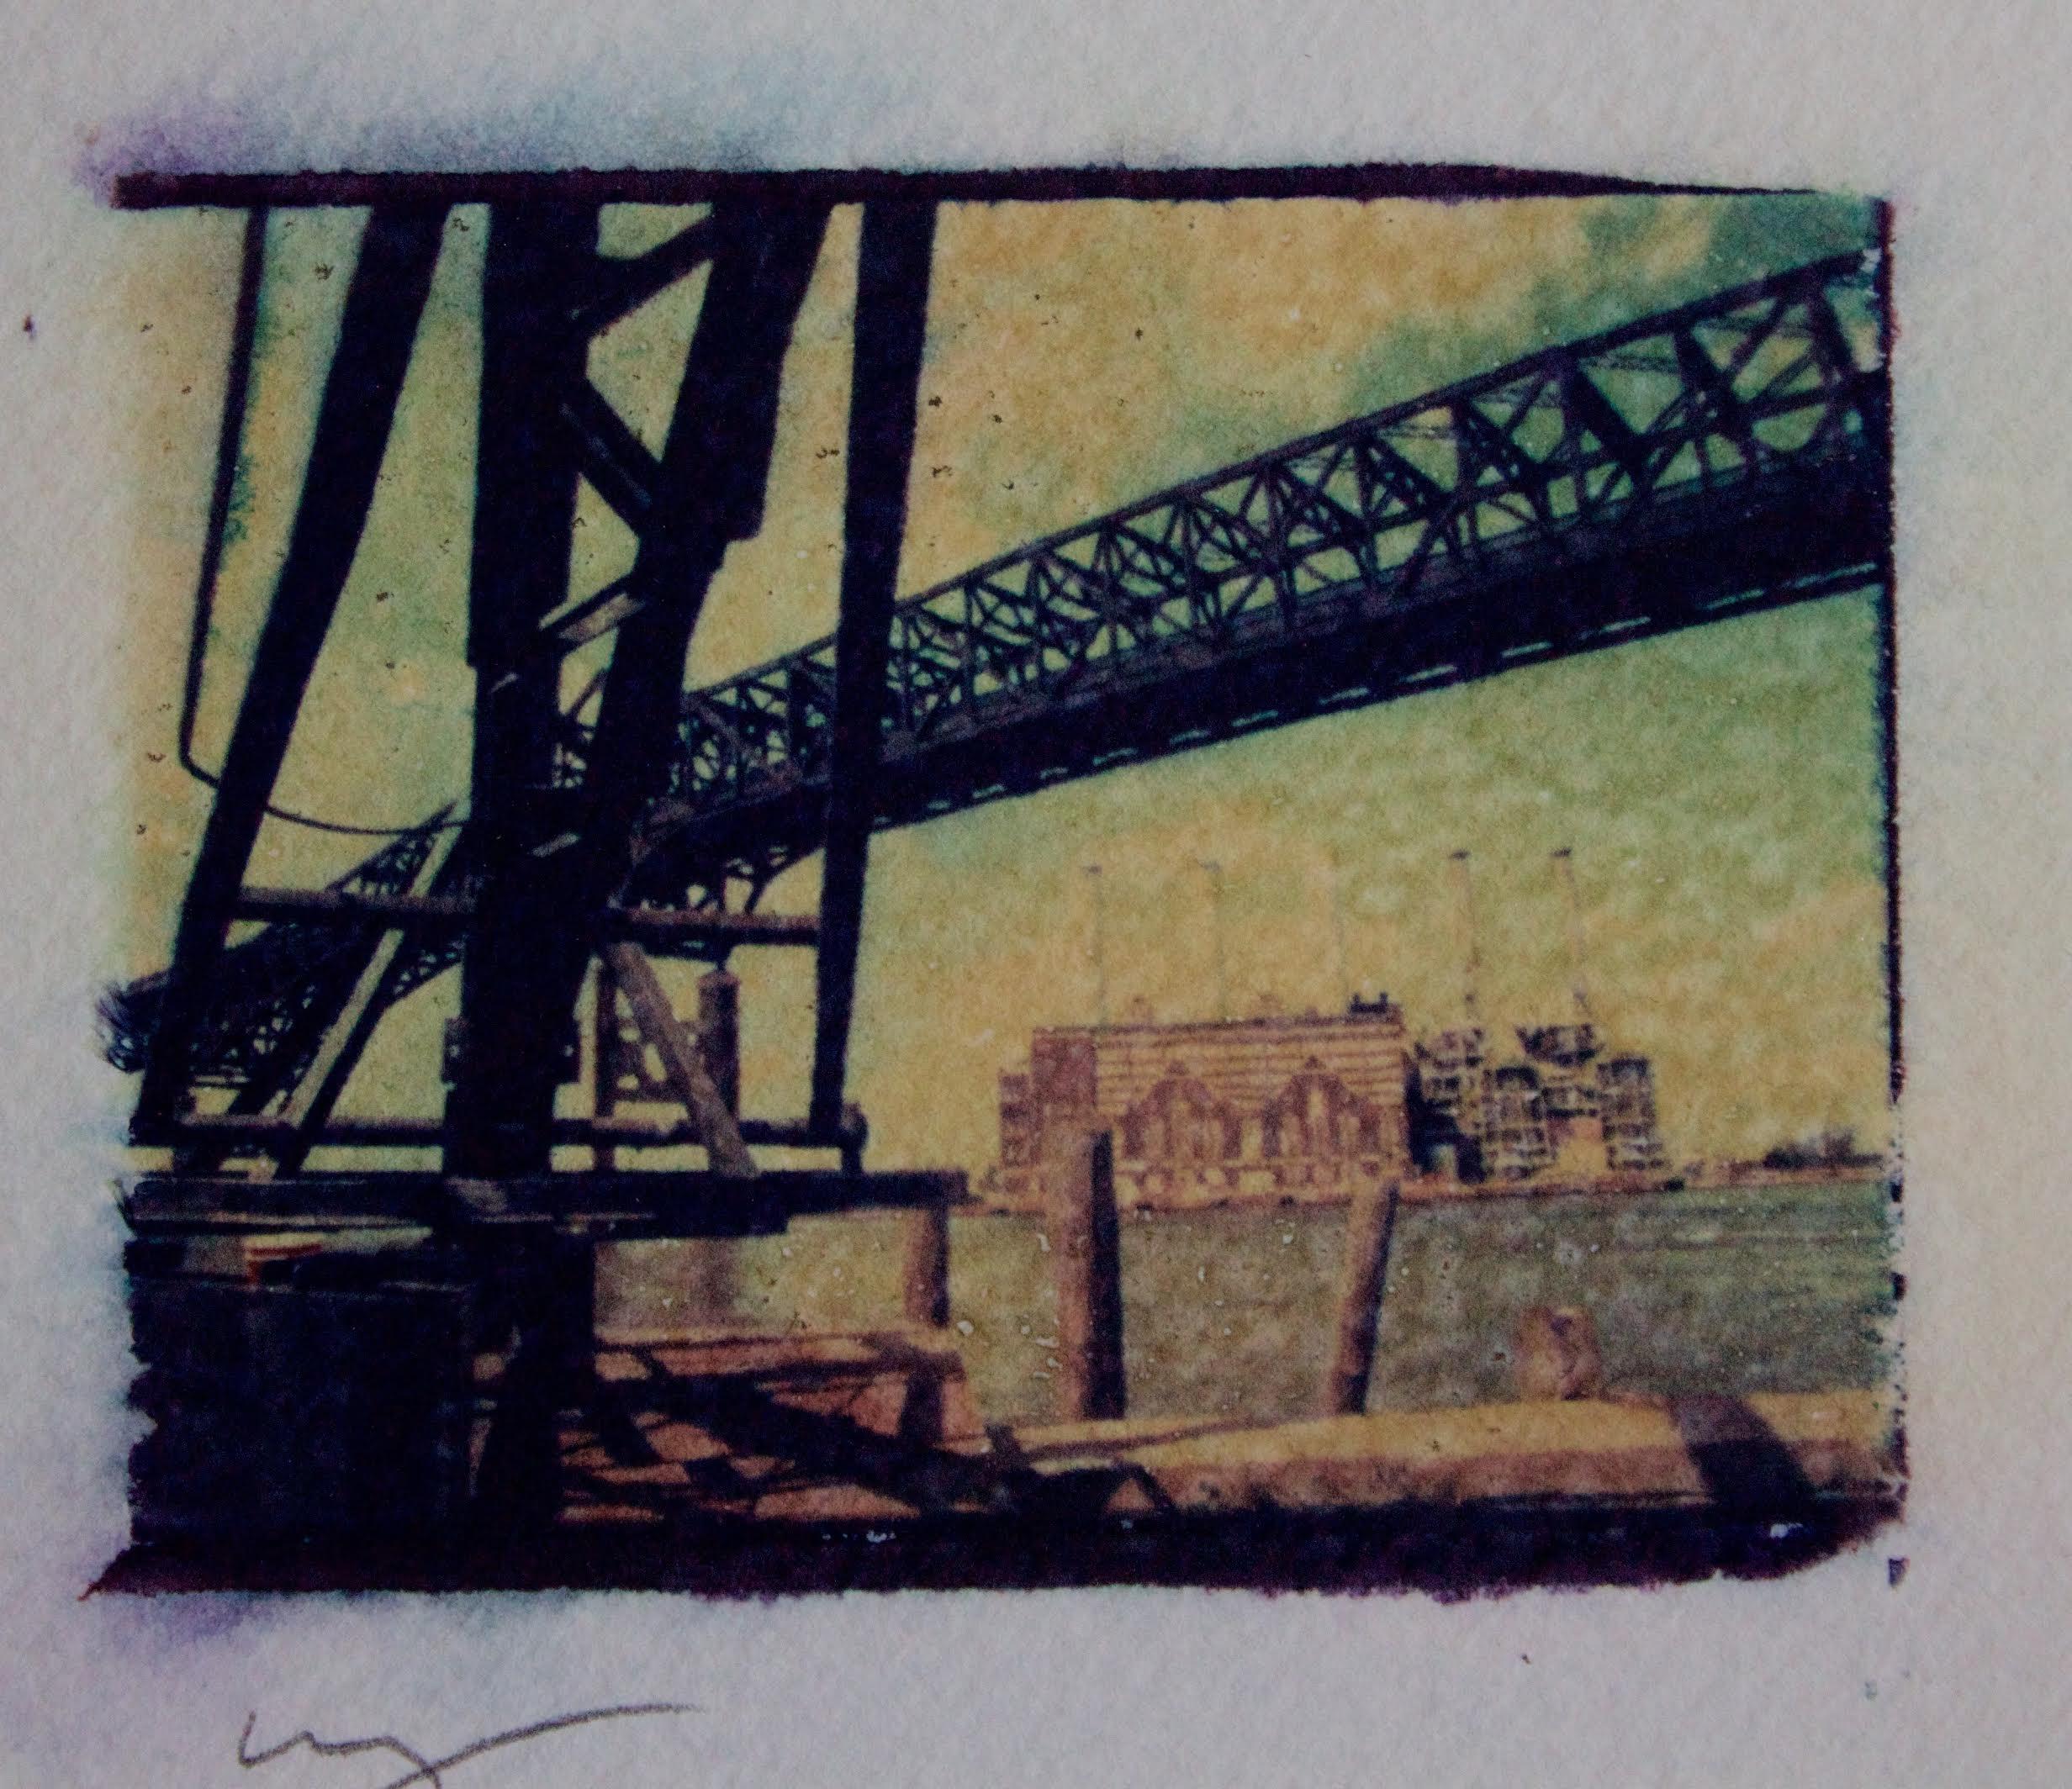 Polaroid dye transfer of Pulaski Skyway, Jersey City. Photograph by Bill Bayer.